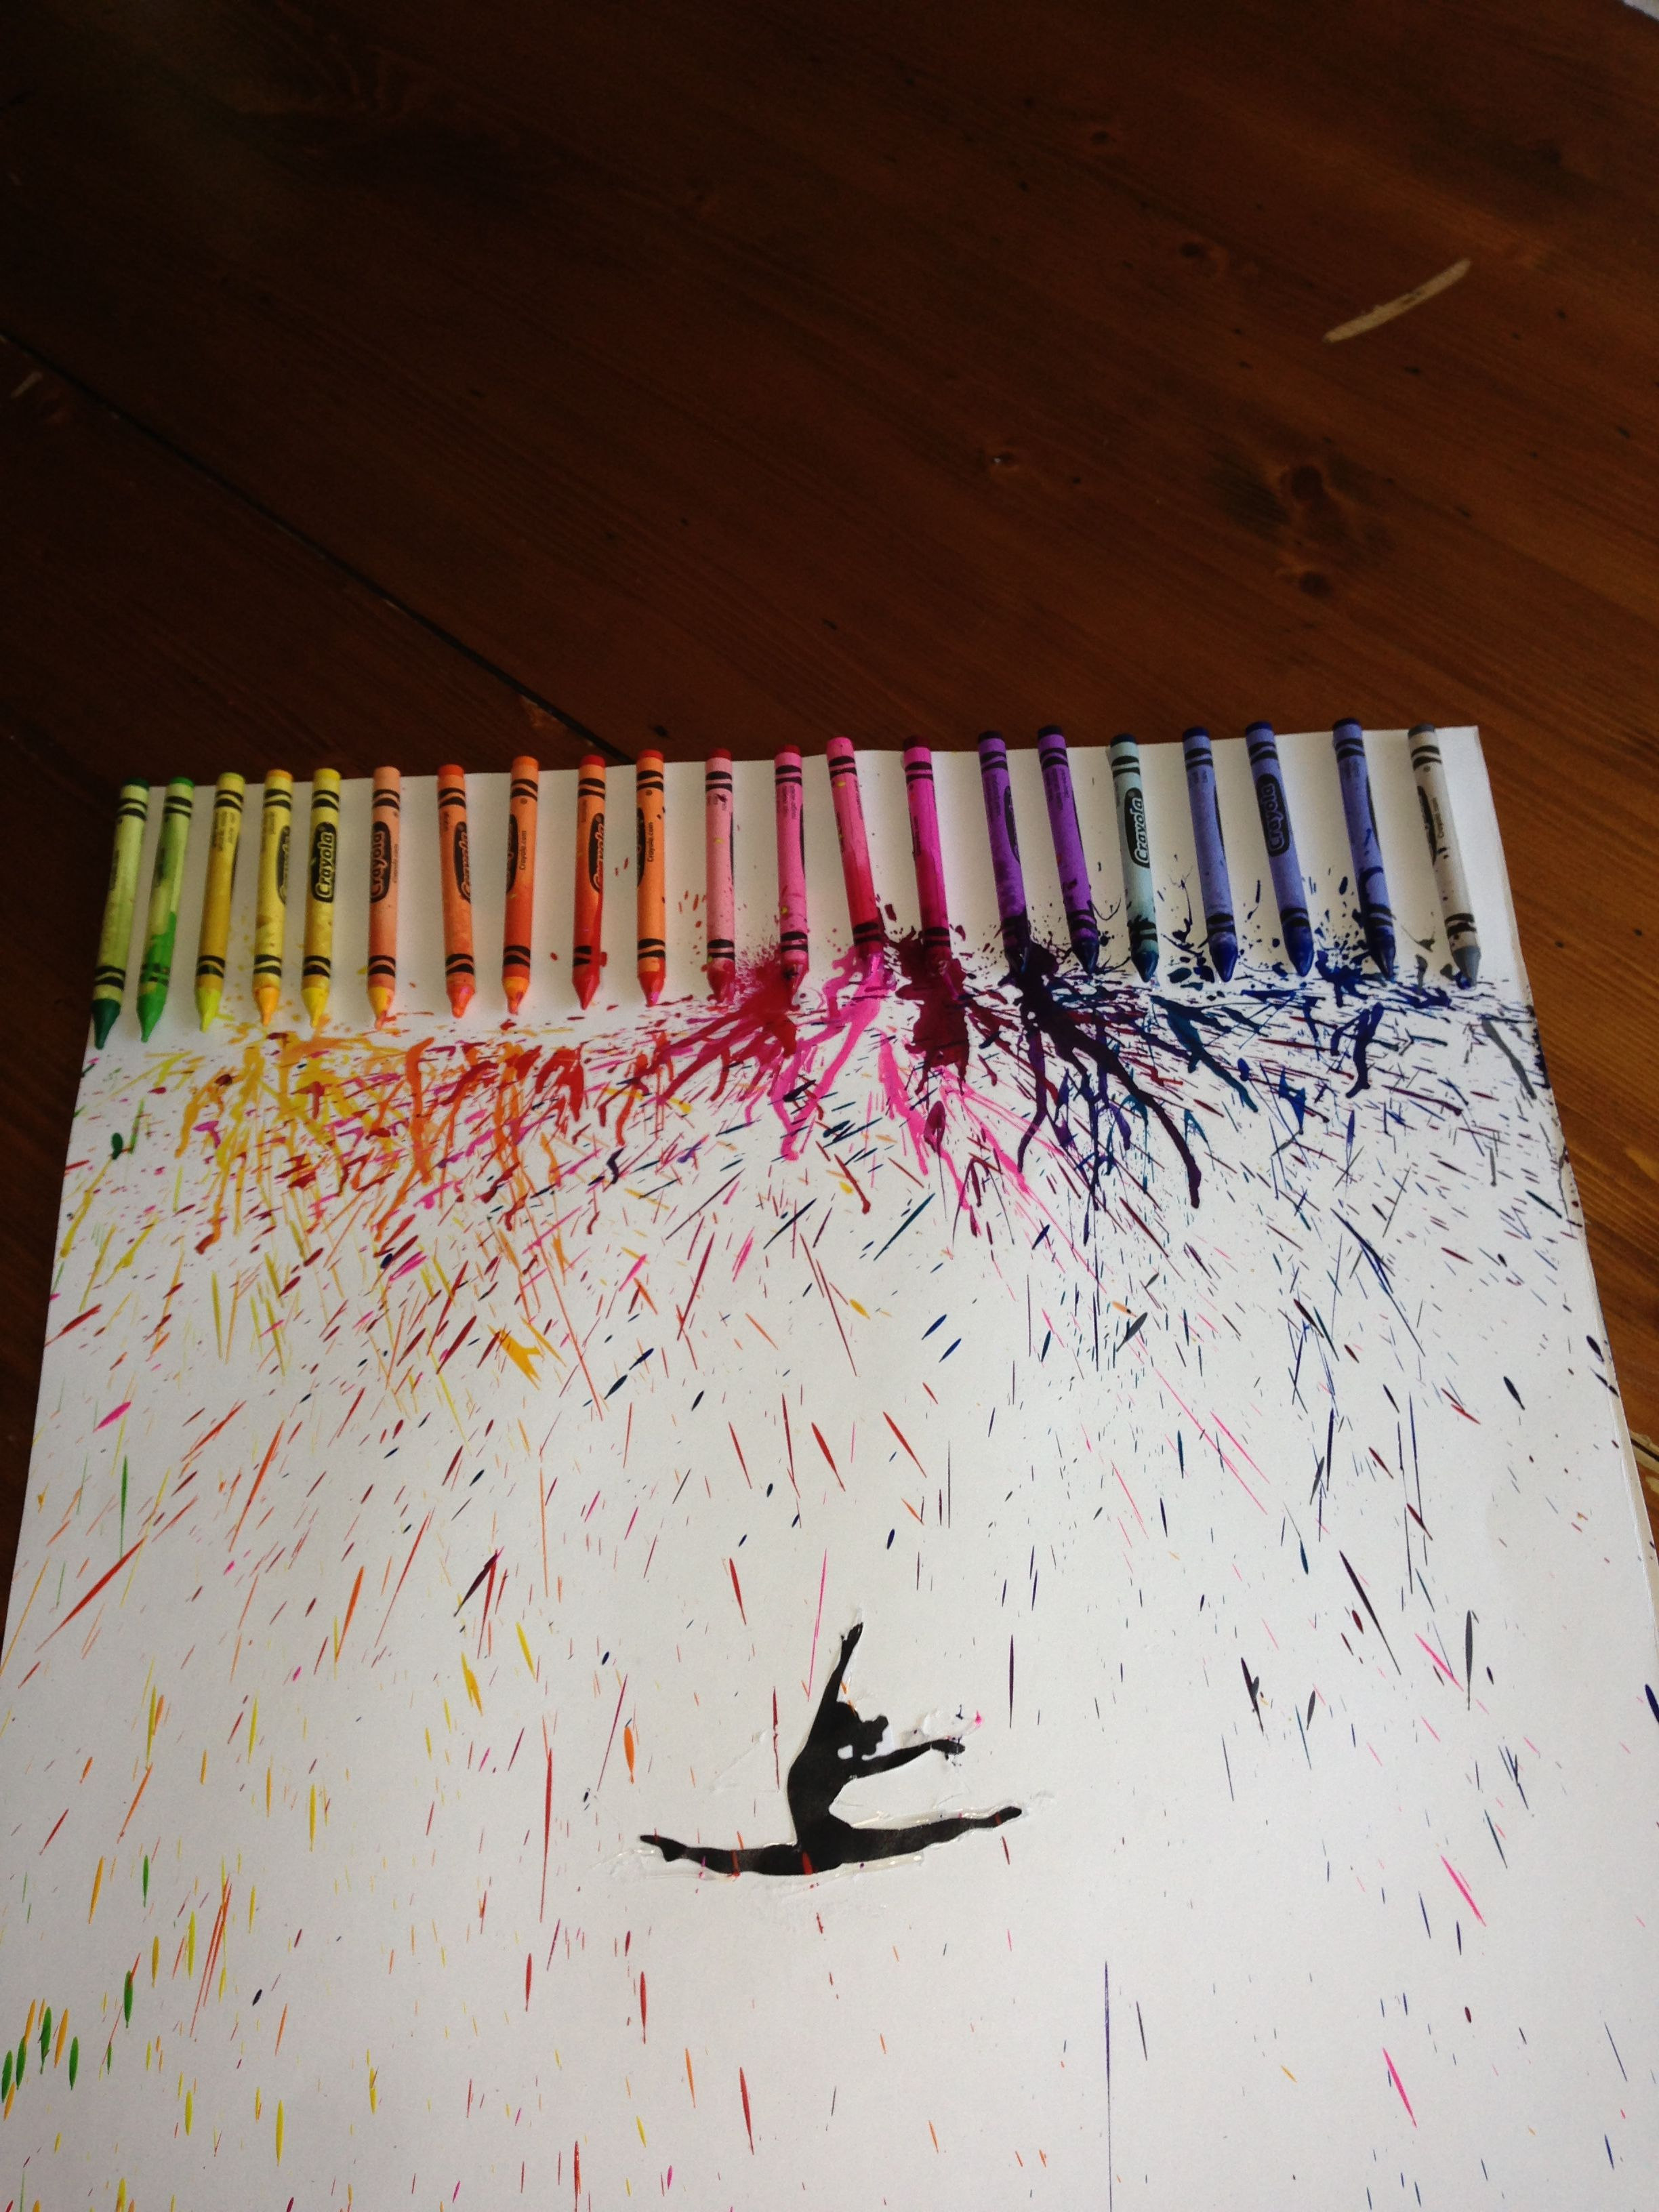 Diy Crayon Art Use Hair Dryer To Melt Crayons Over